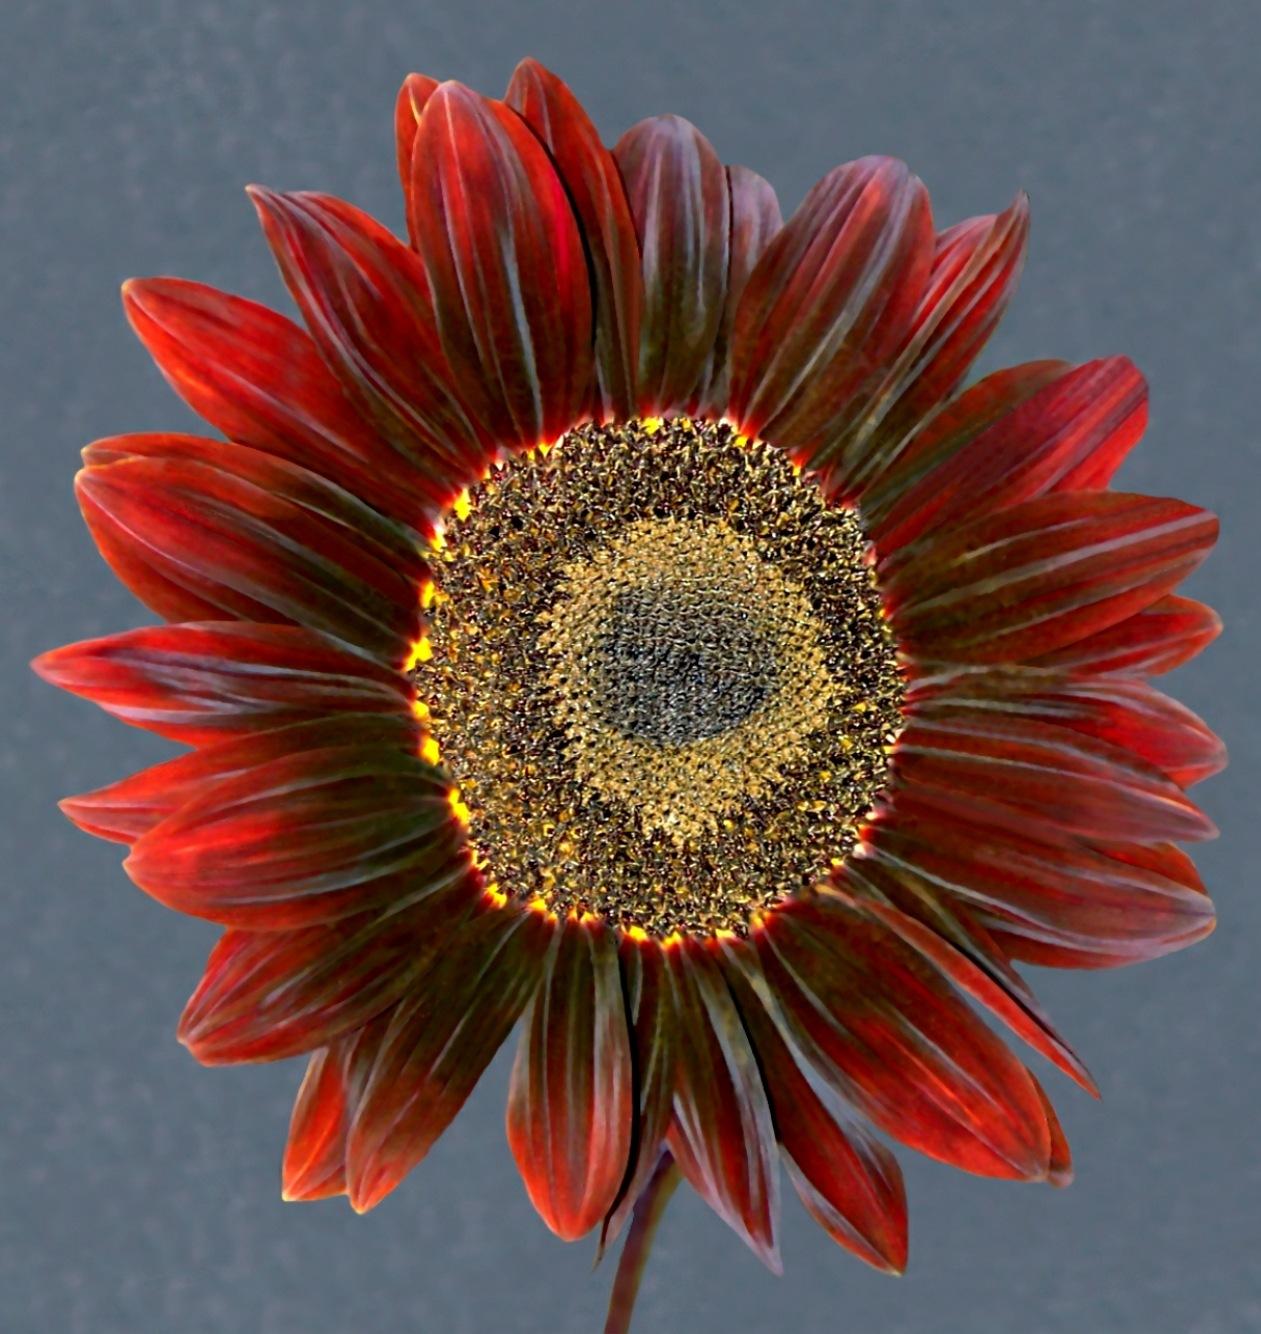 Sensational Sunflower 7 by RMCROC